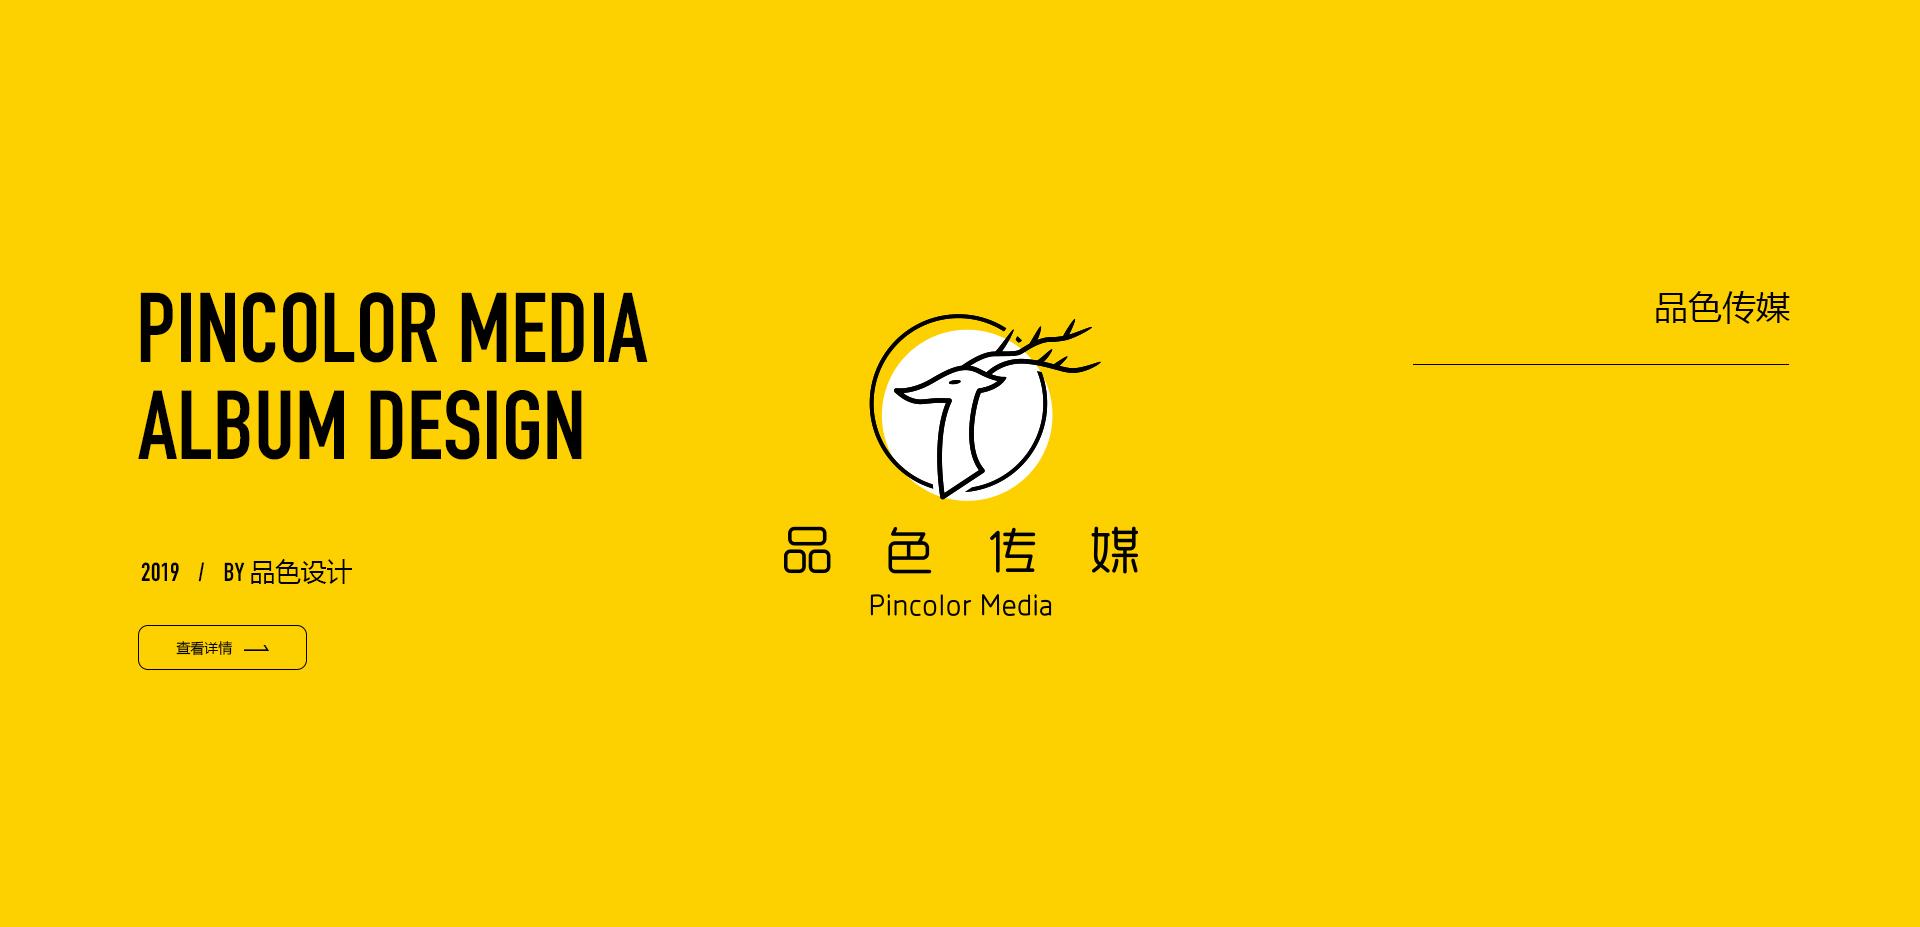 PINSE传媒品牌设计